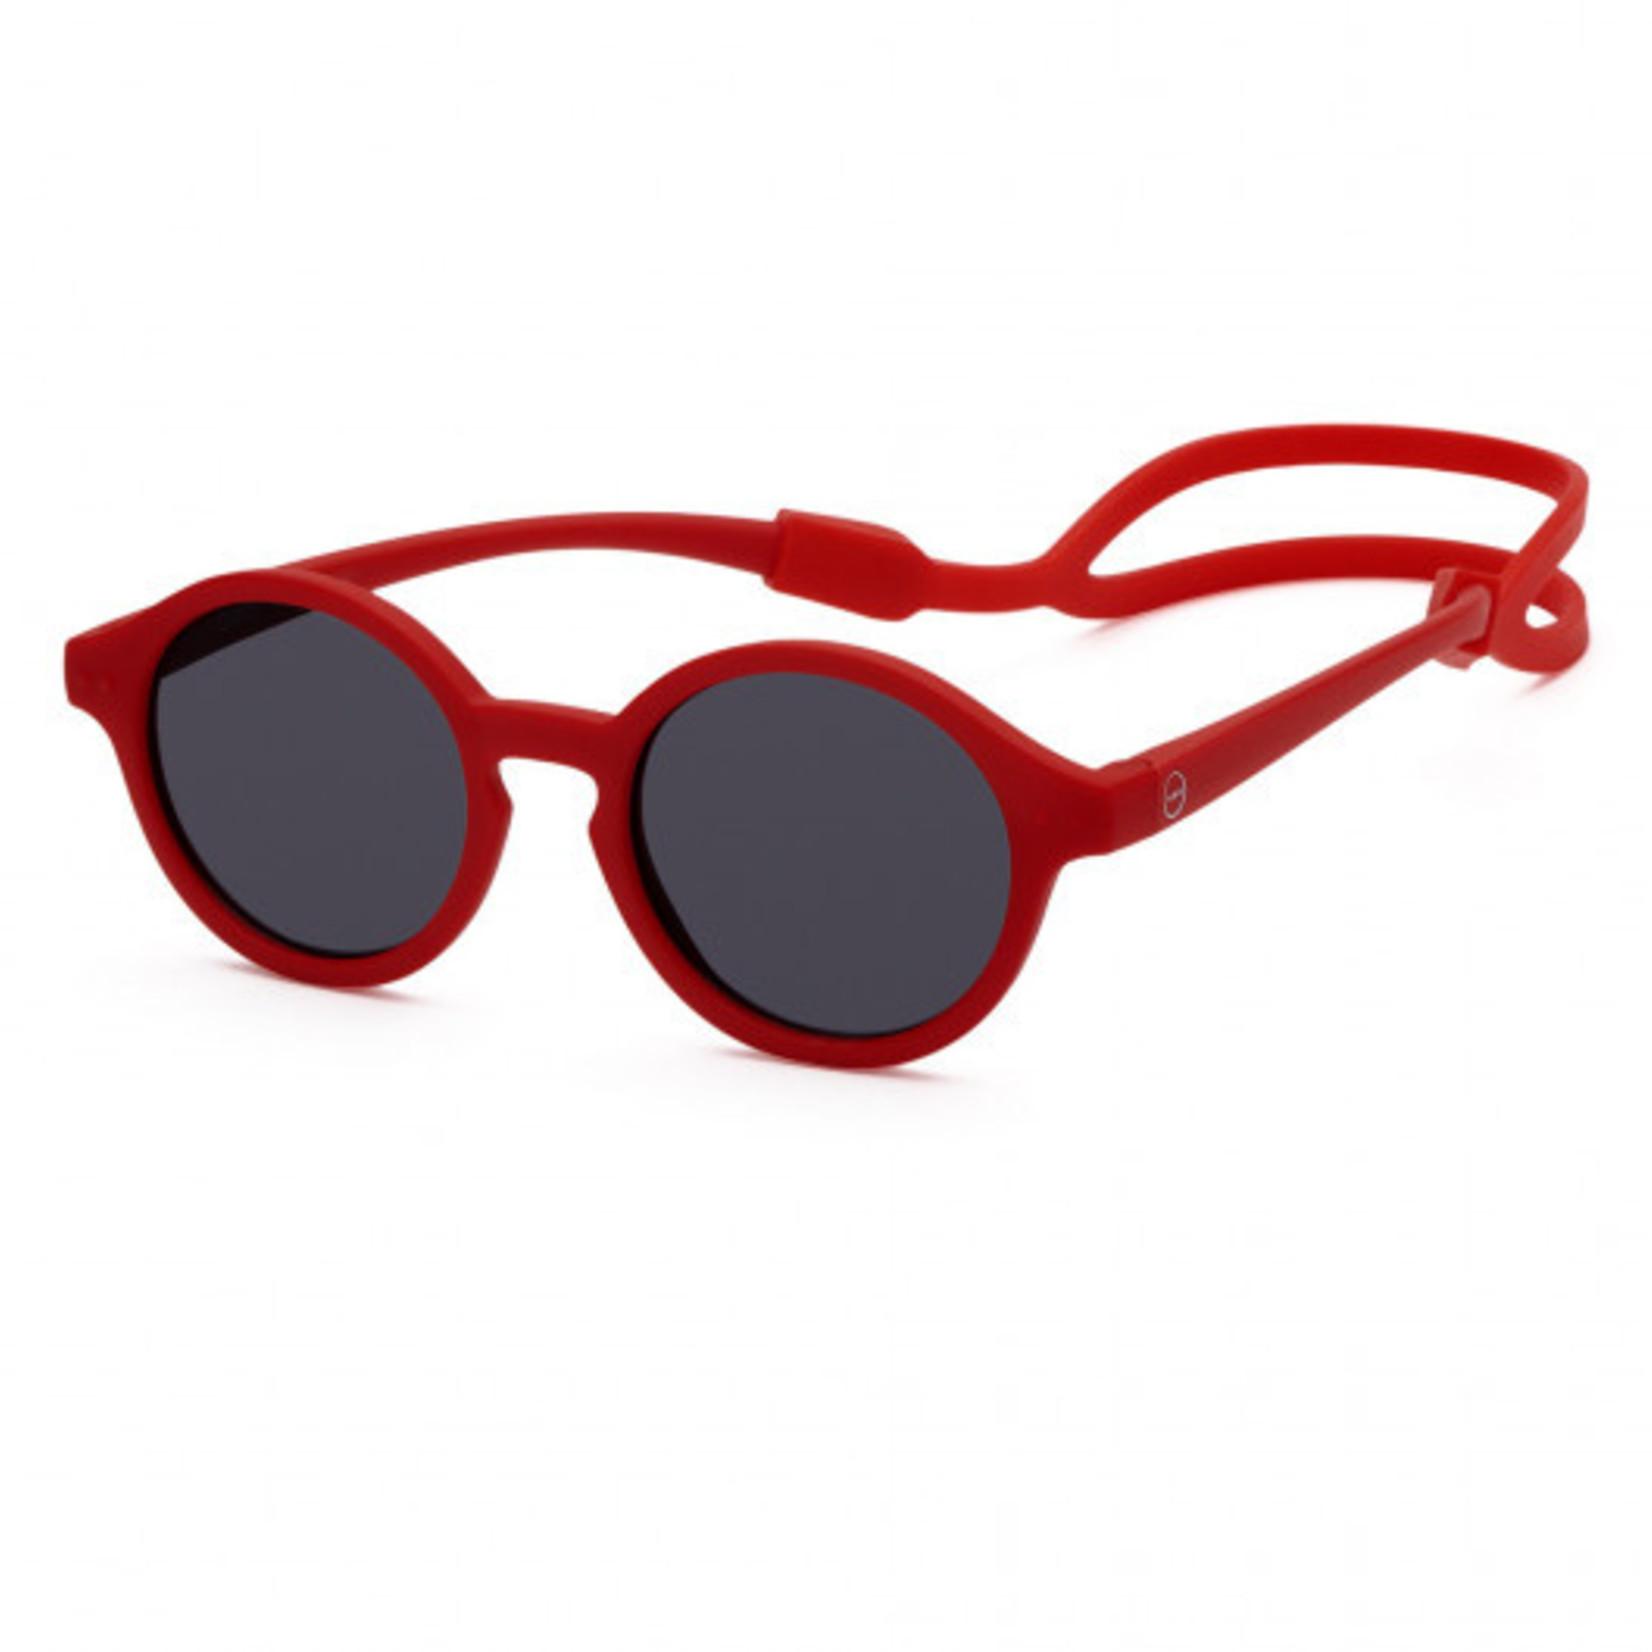 IZIPIZI Izipizi Kids Plus Sunglasses Red - Polarized